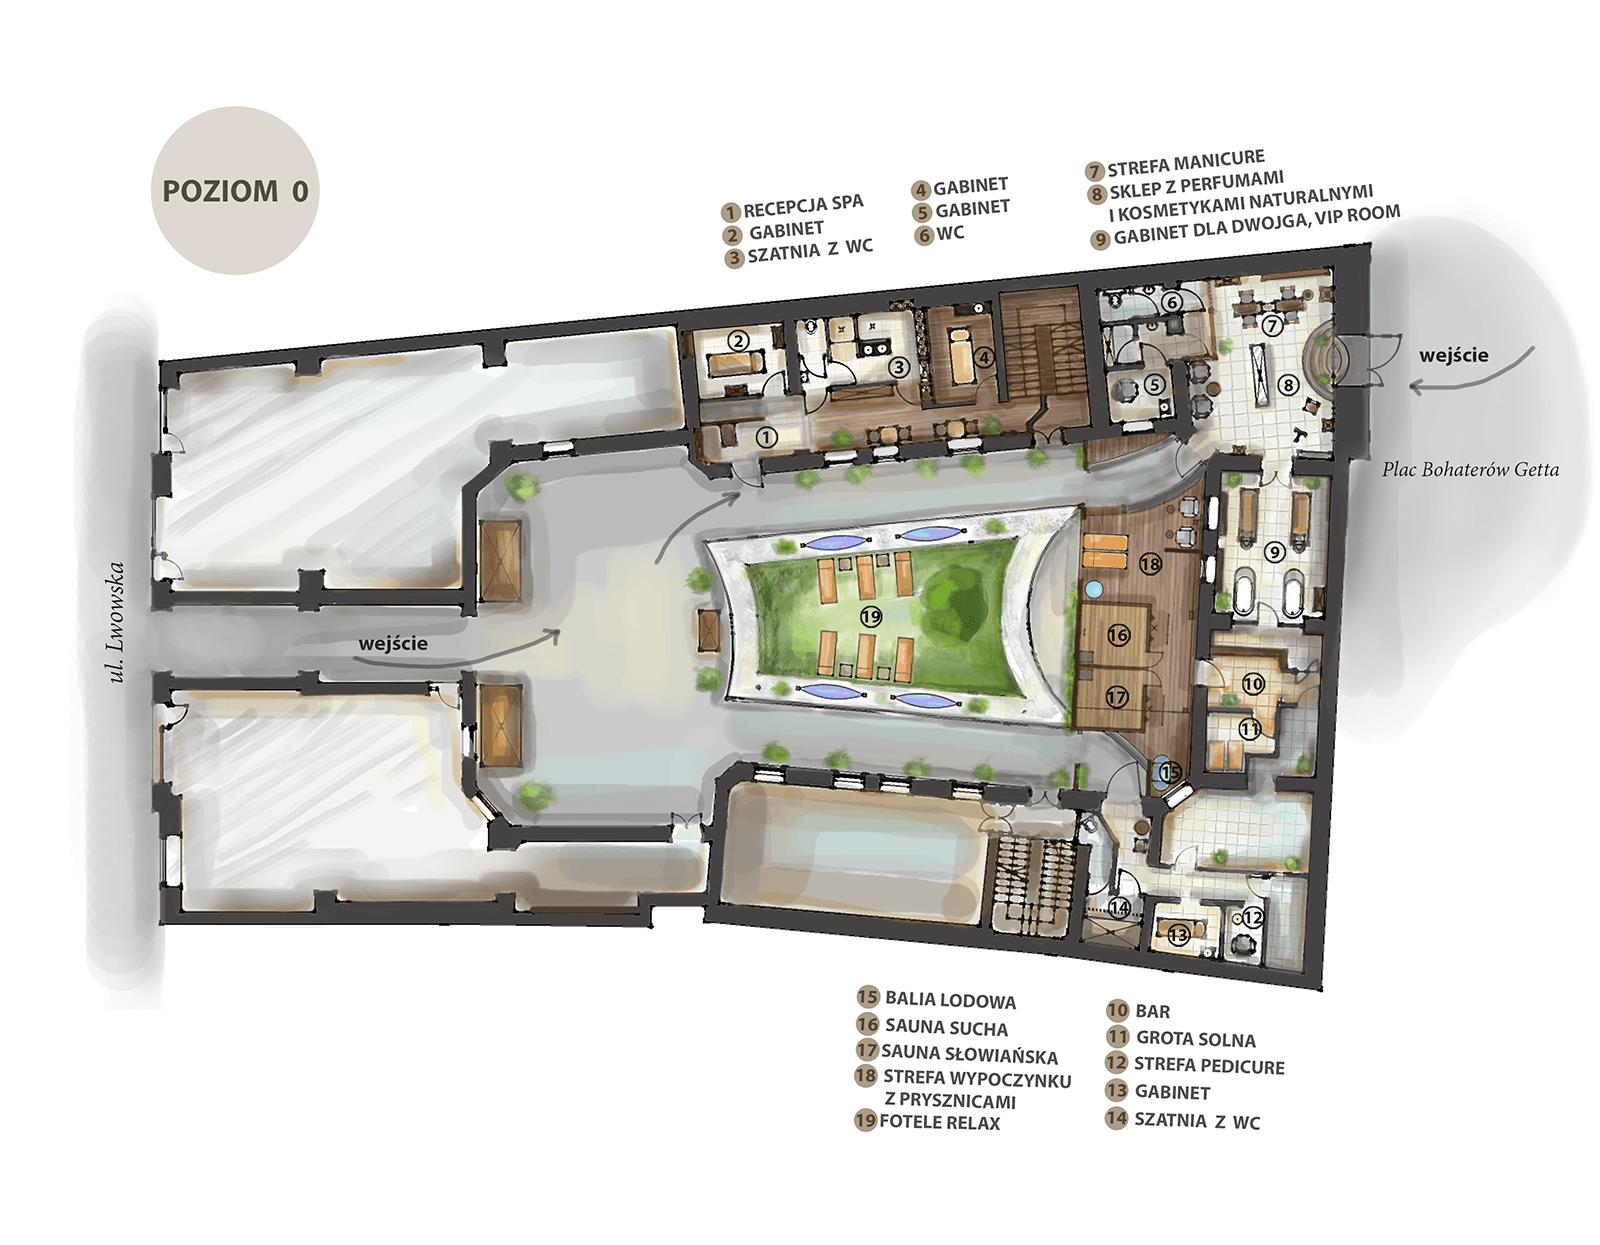 piwnica spa & wellness mapa ośrodka